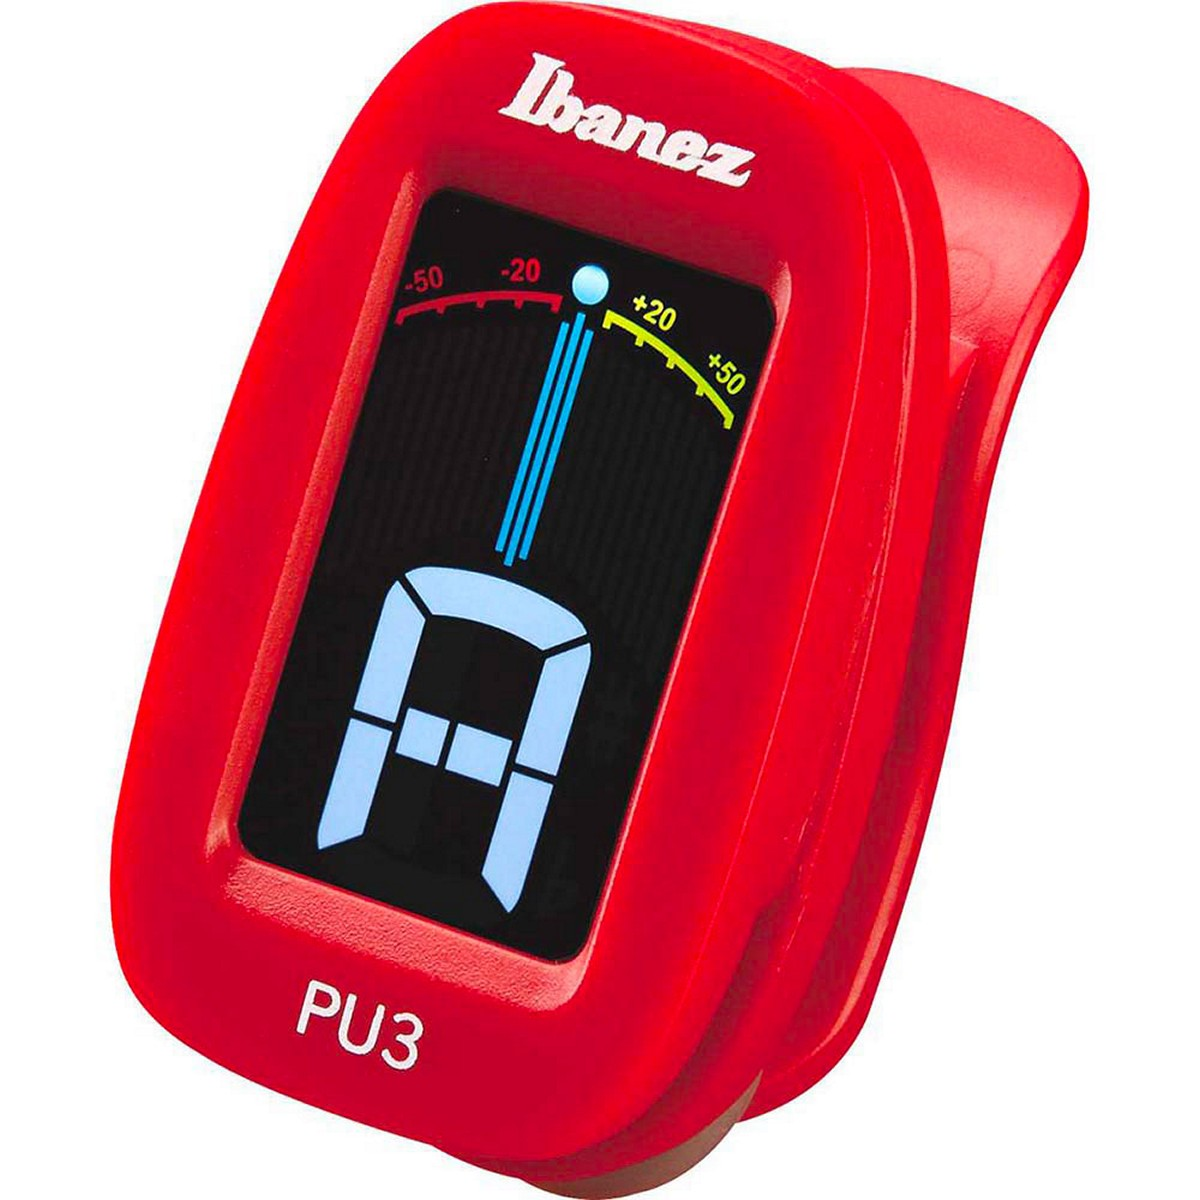 IBANEZ PU3-RD - ACCORDATORE A CLIP